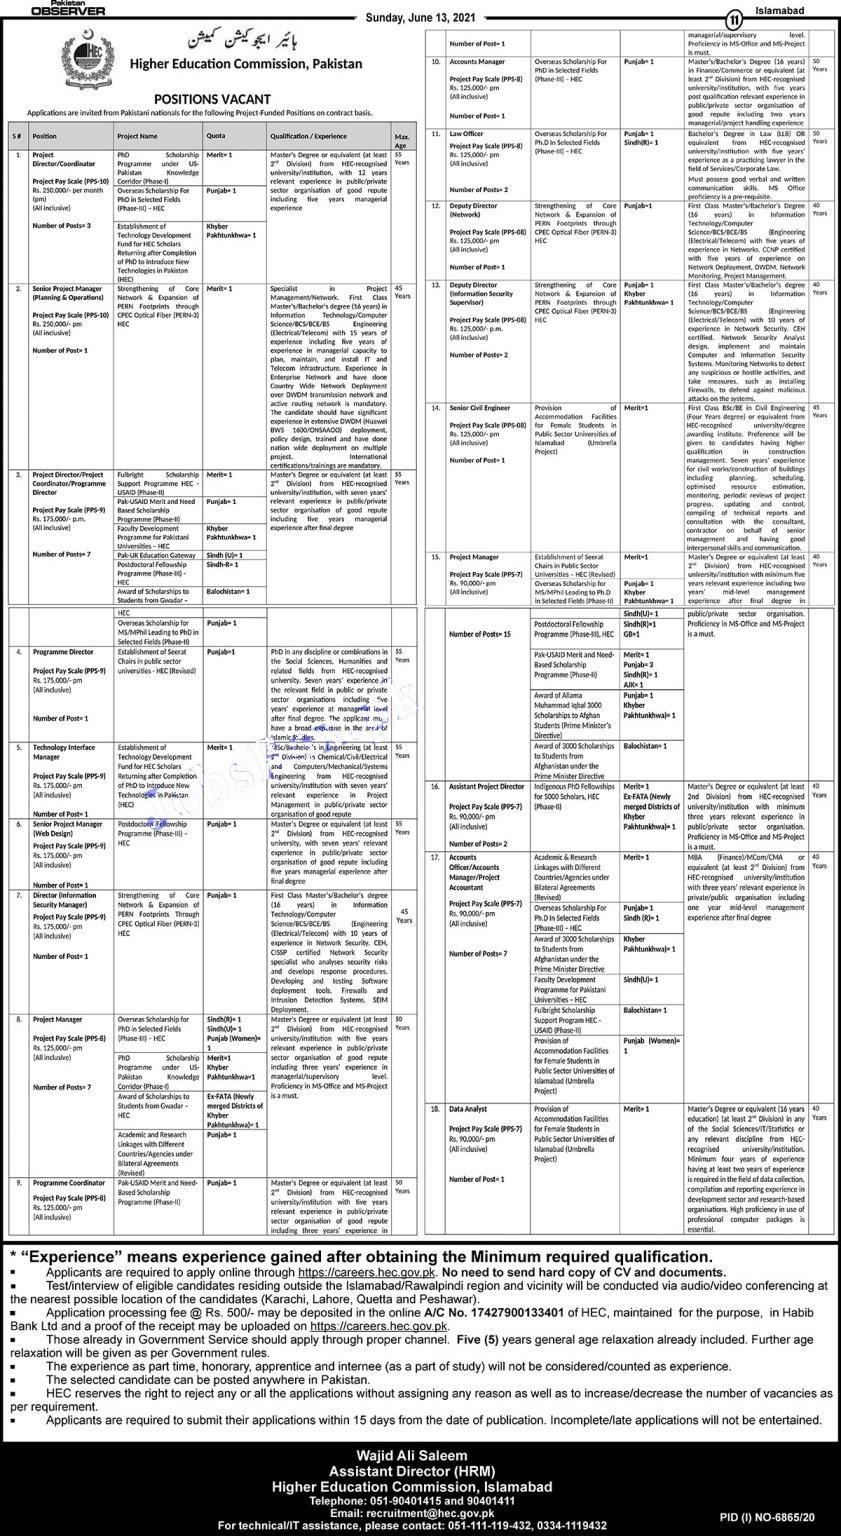 HEC jobs 2021 | Higher Education Commission jobs 2021 Via careers.hec.gov.pk